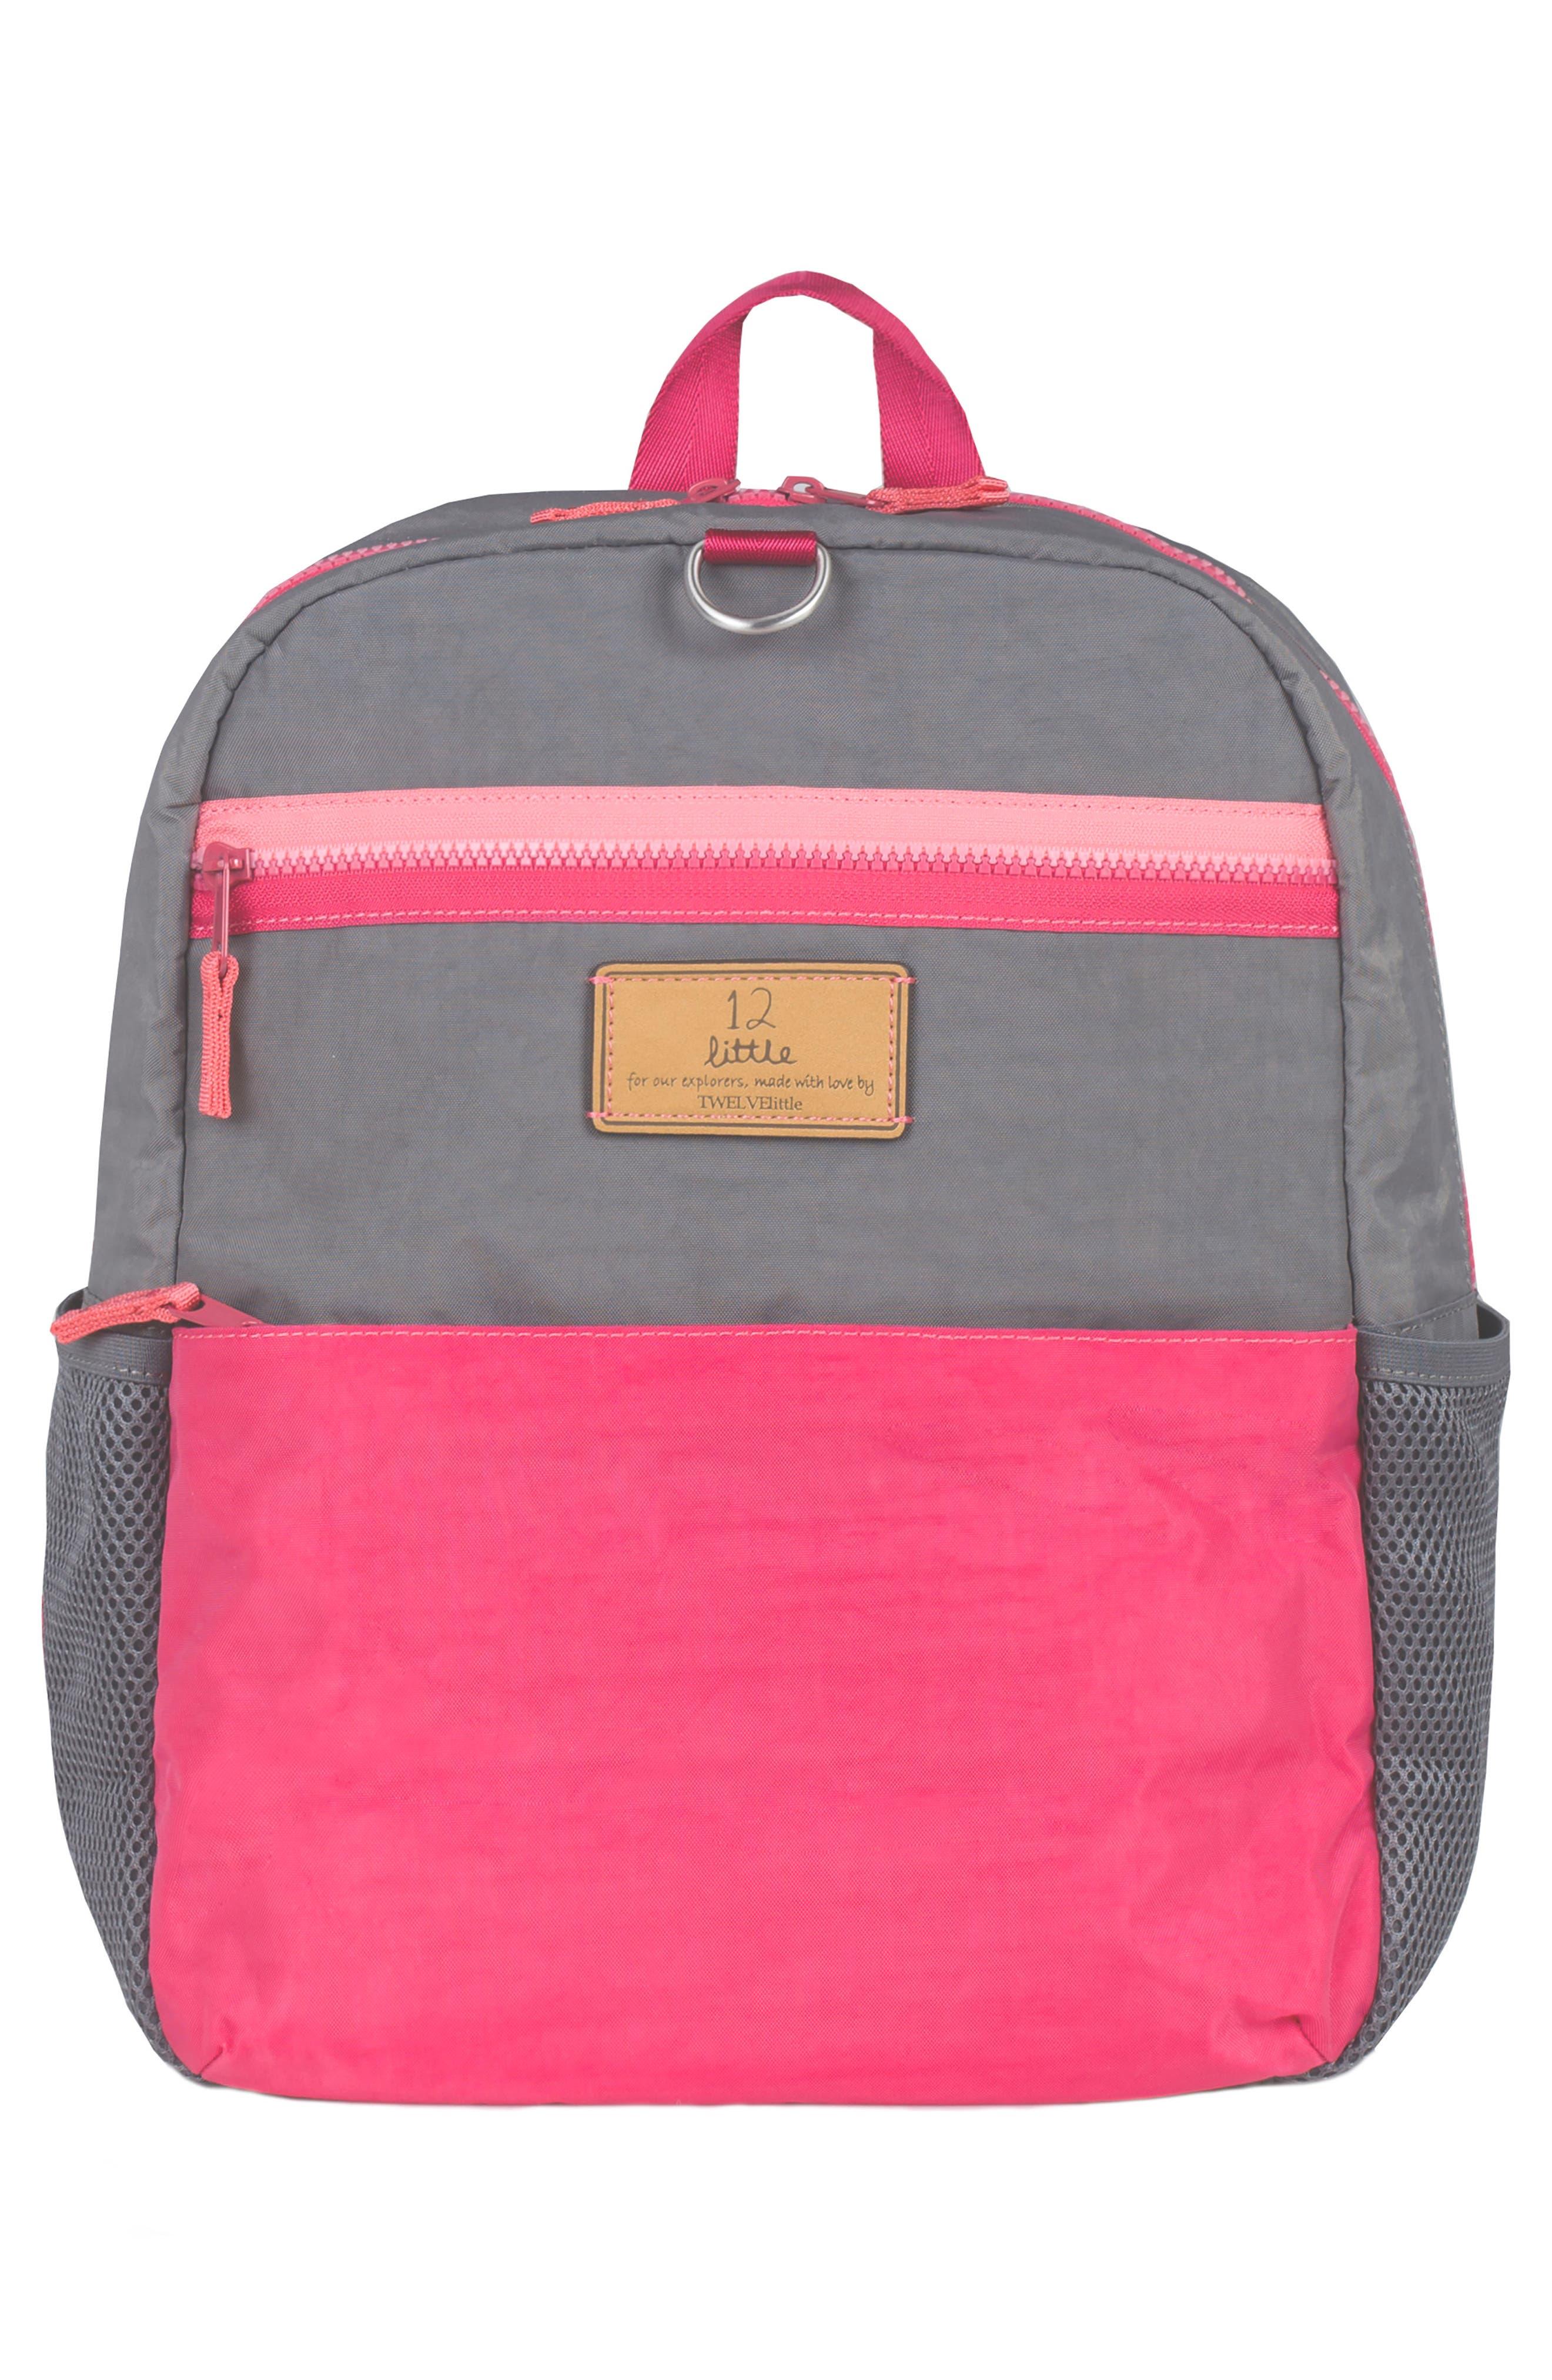 Alternate Image 4  - TWELVElittle Courage Backpack (Kids)